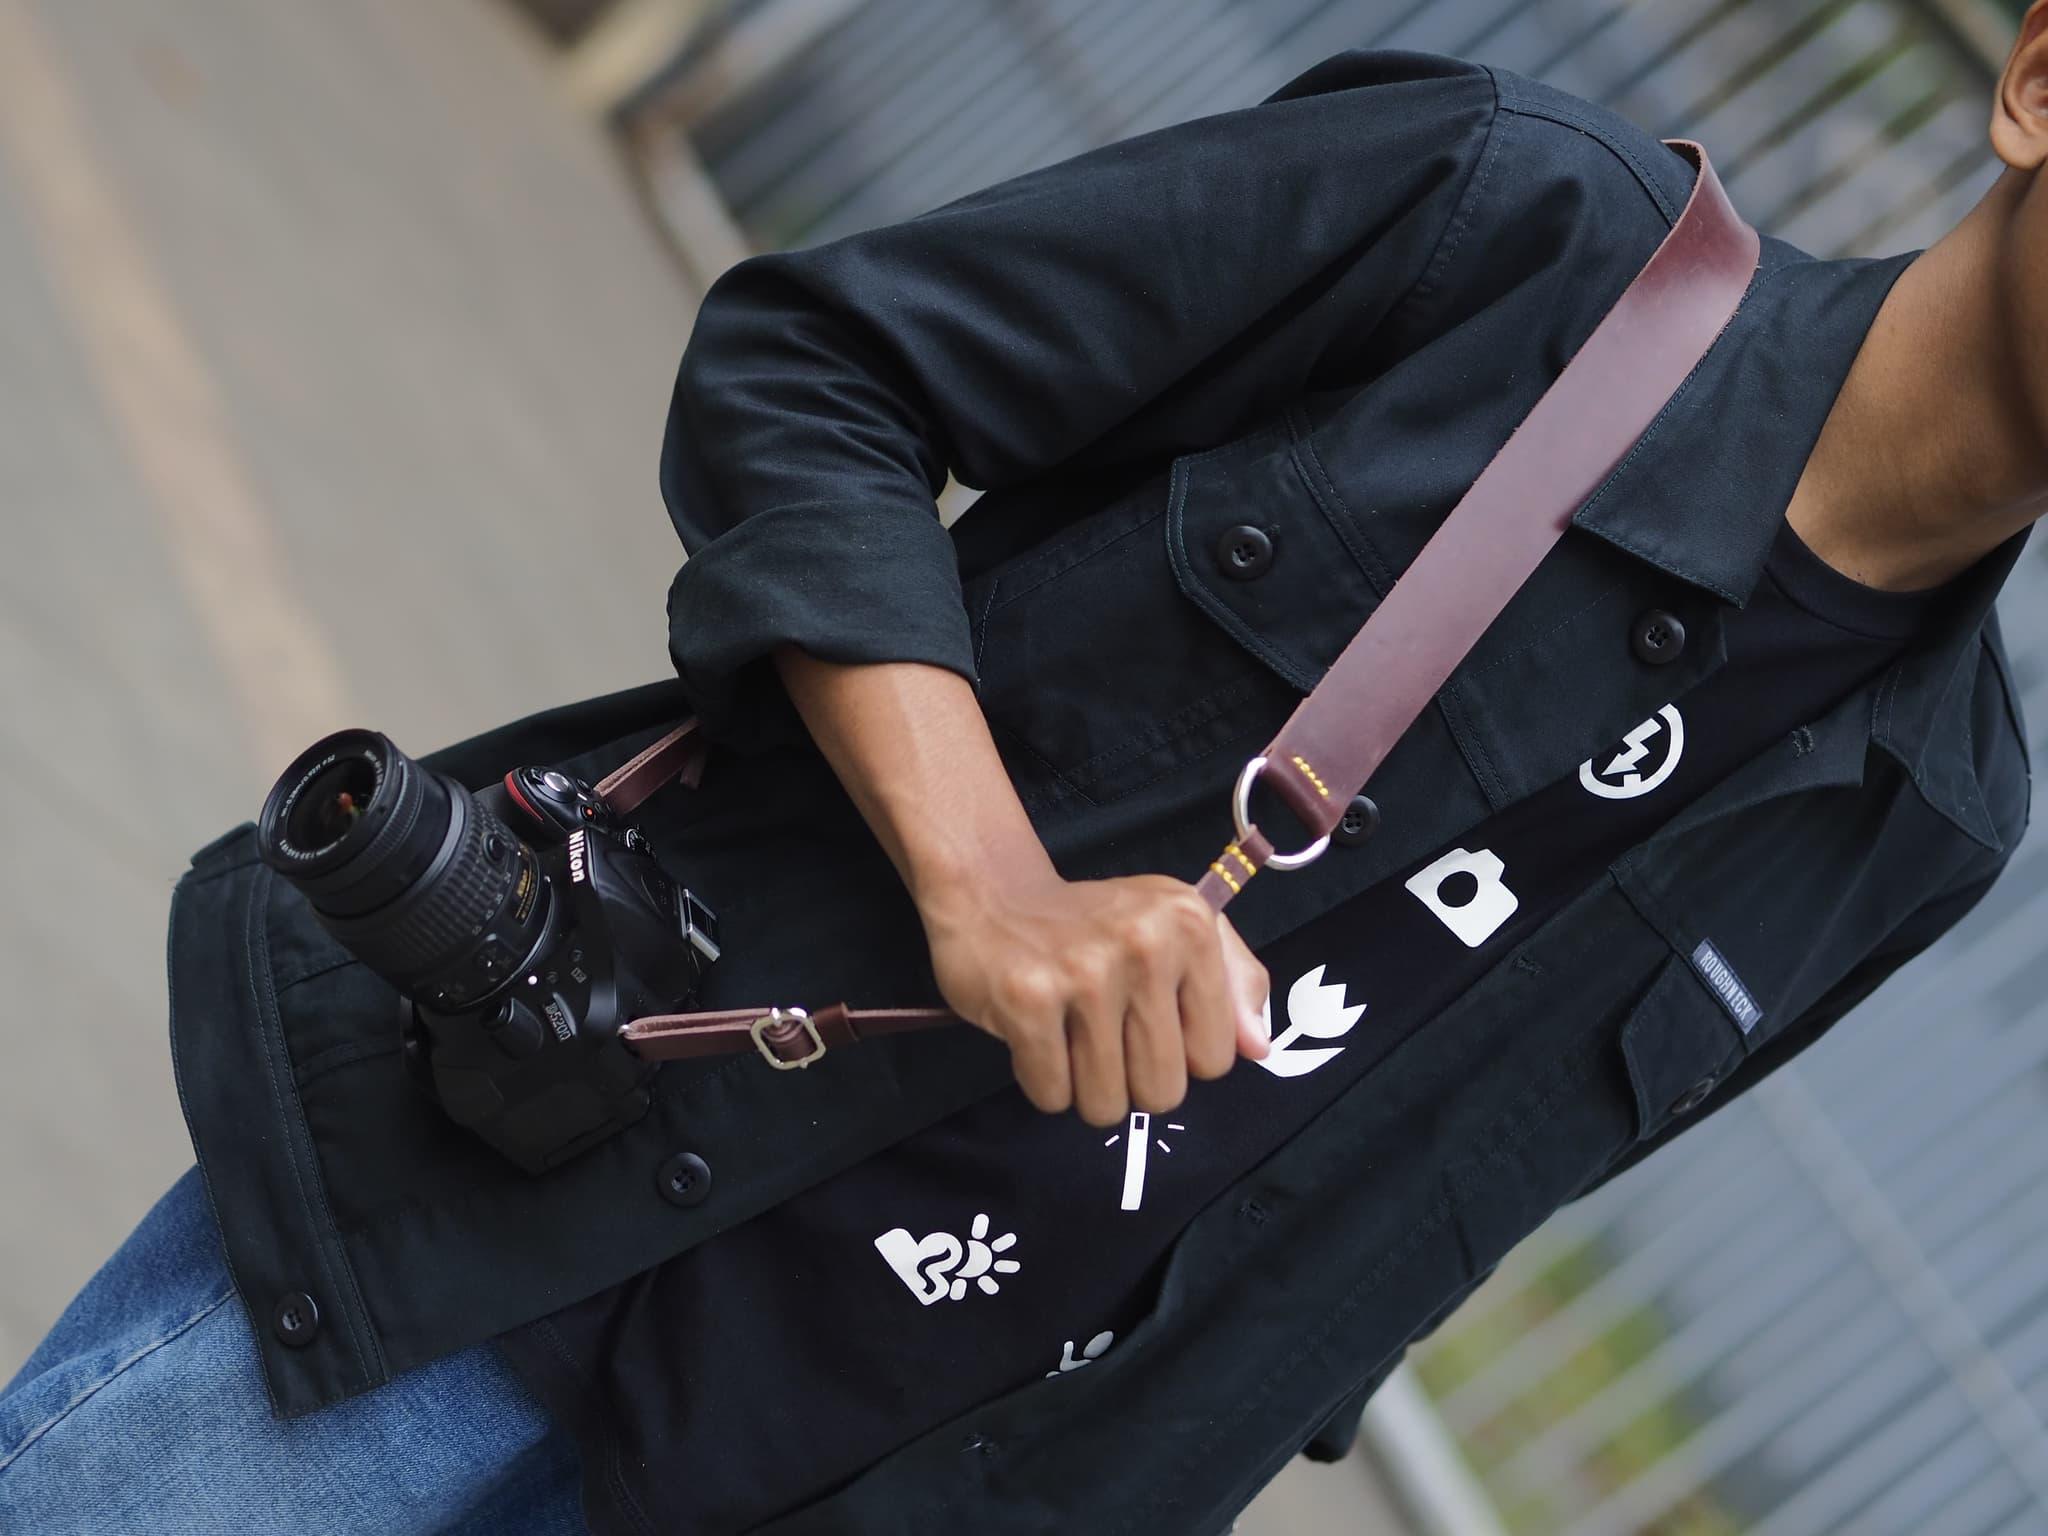 Strap Camera / Neck Strap / Tali Kamera / Molea Leather Strap - Blanja.com